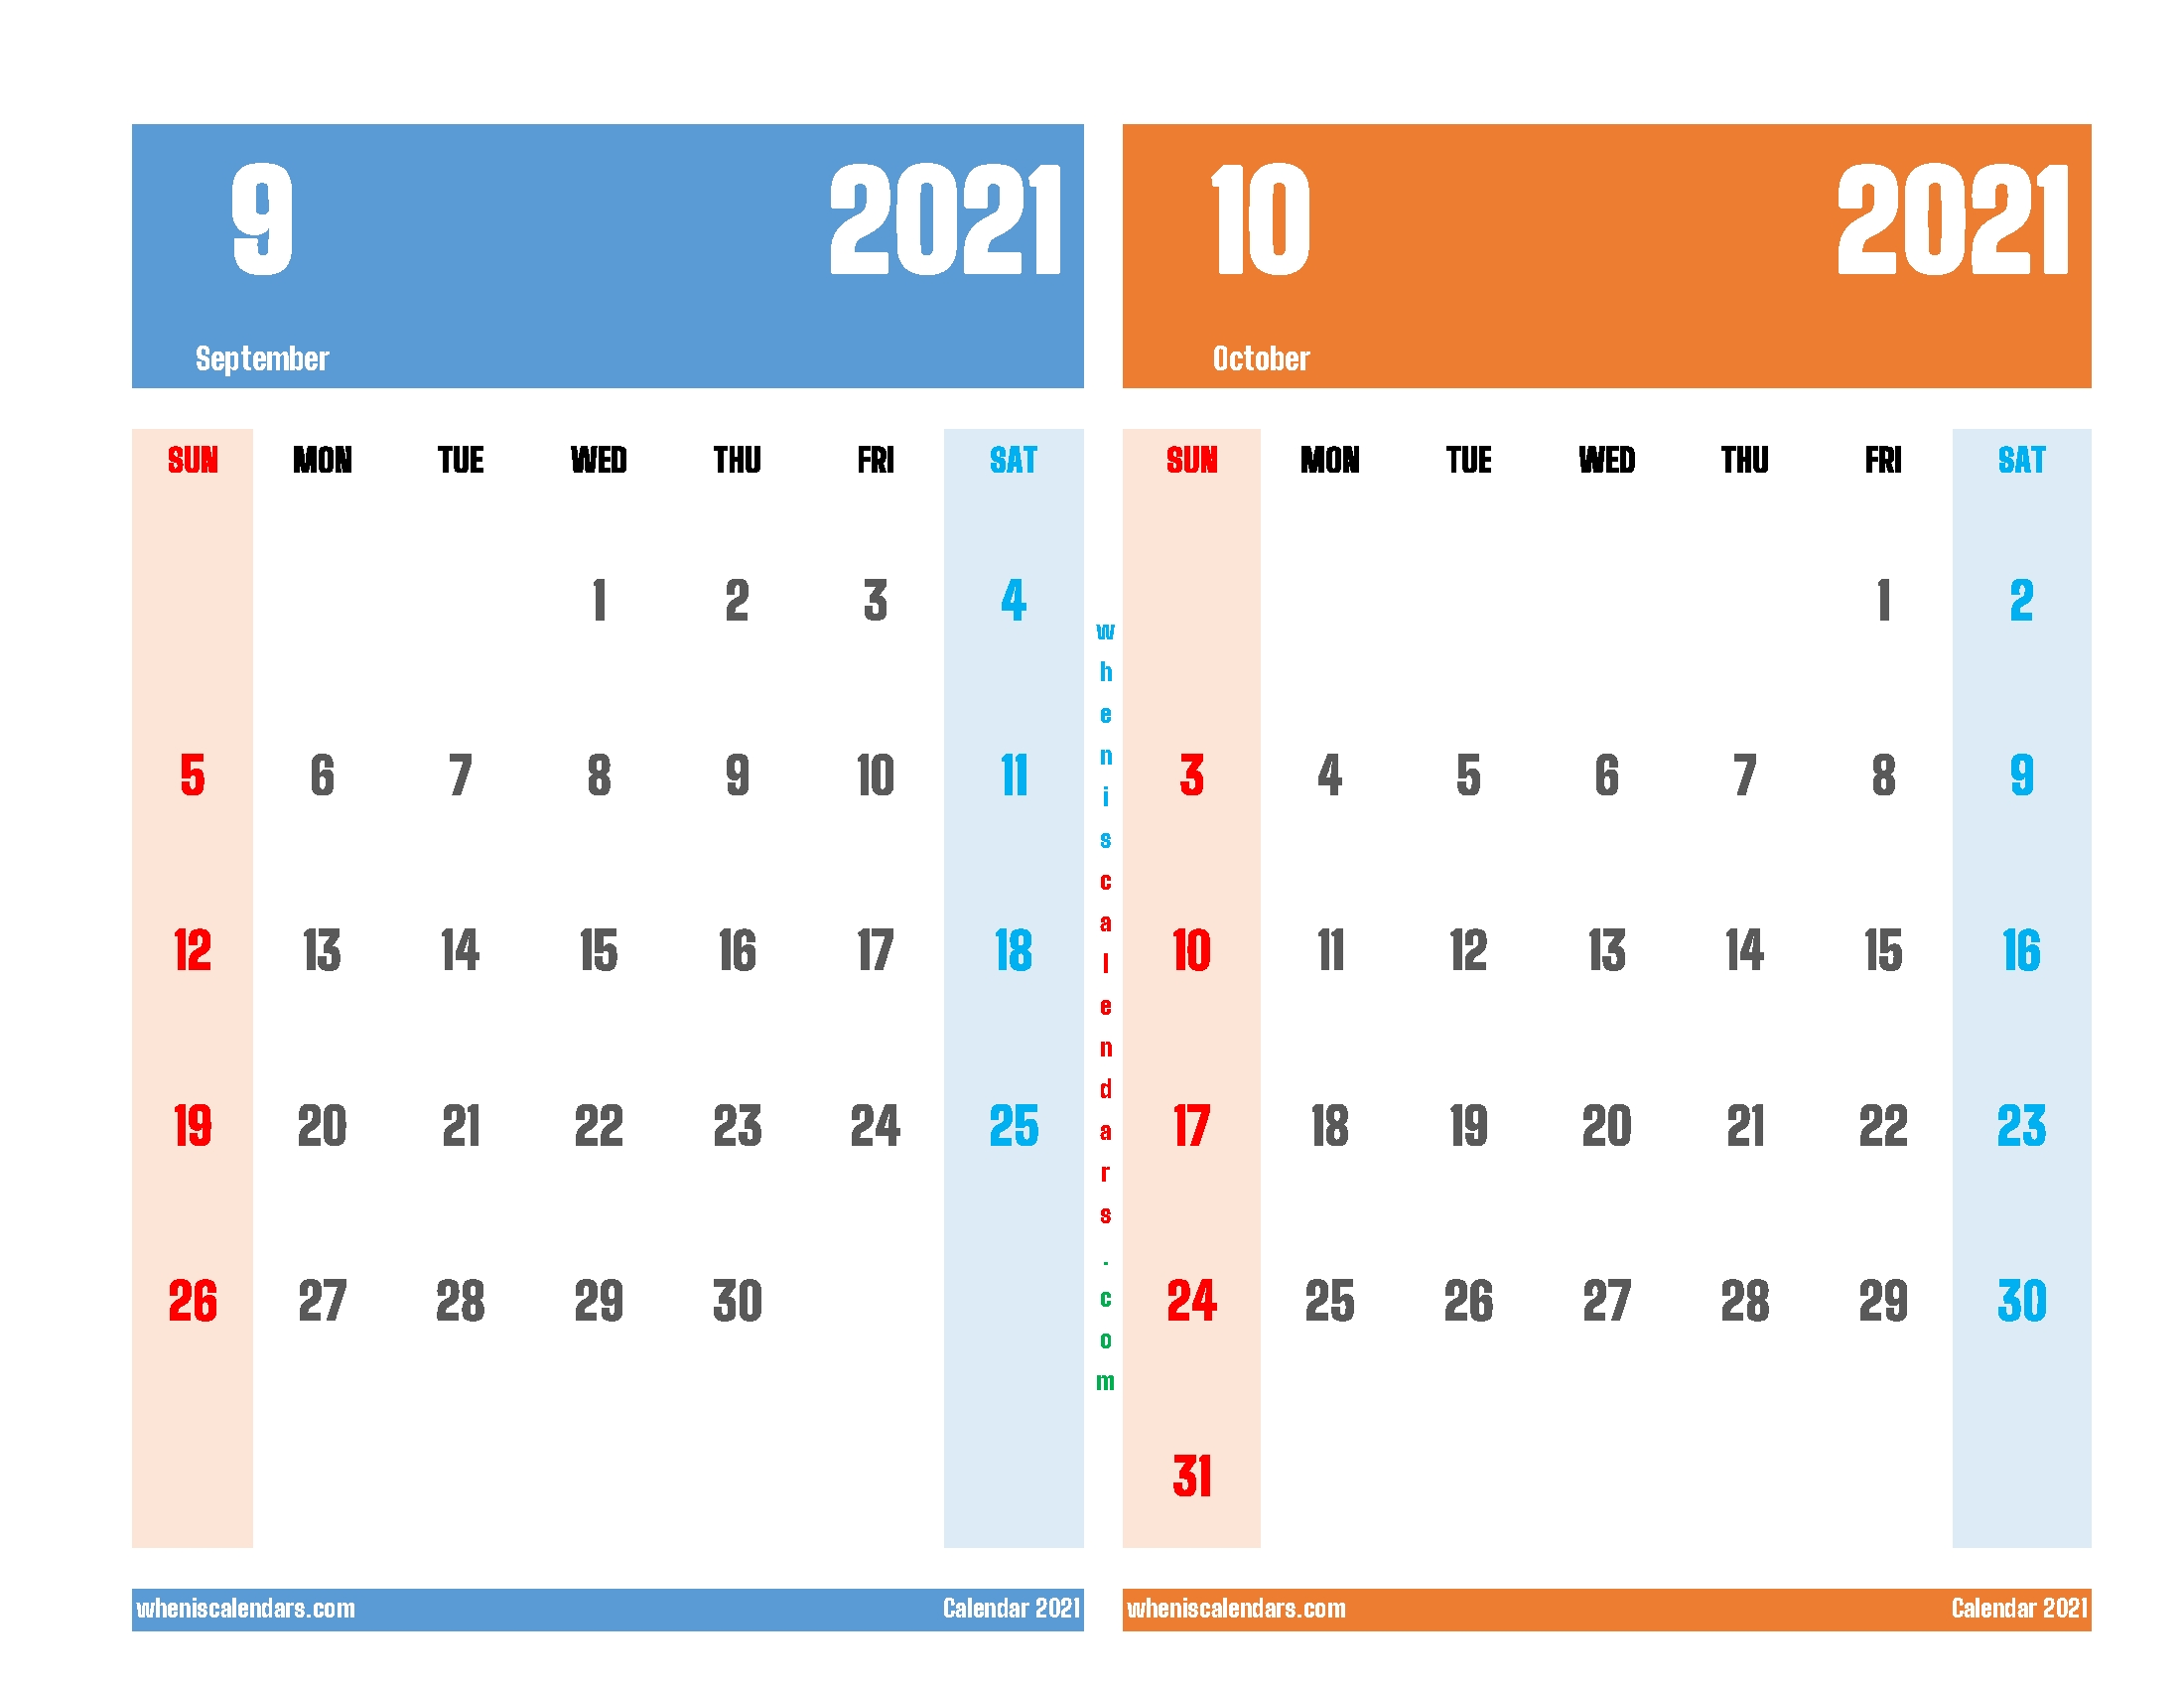 Calendar For September And October 2021 September And October 2021 Calendar